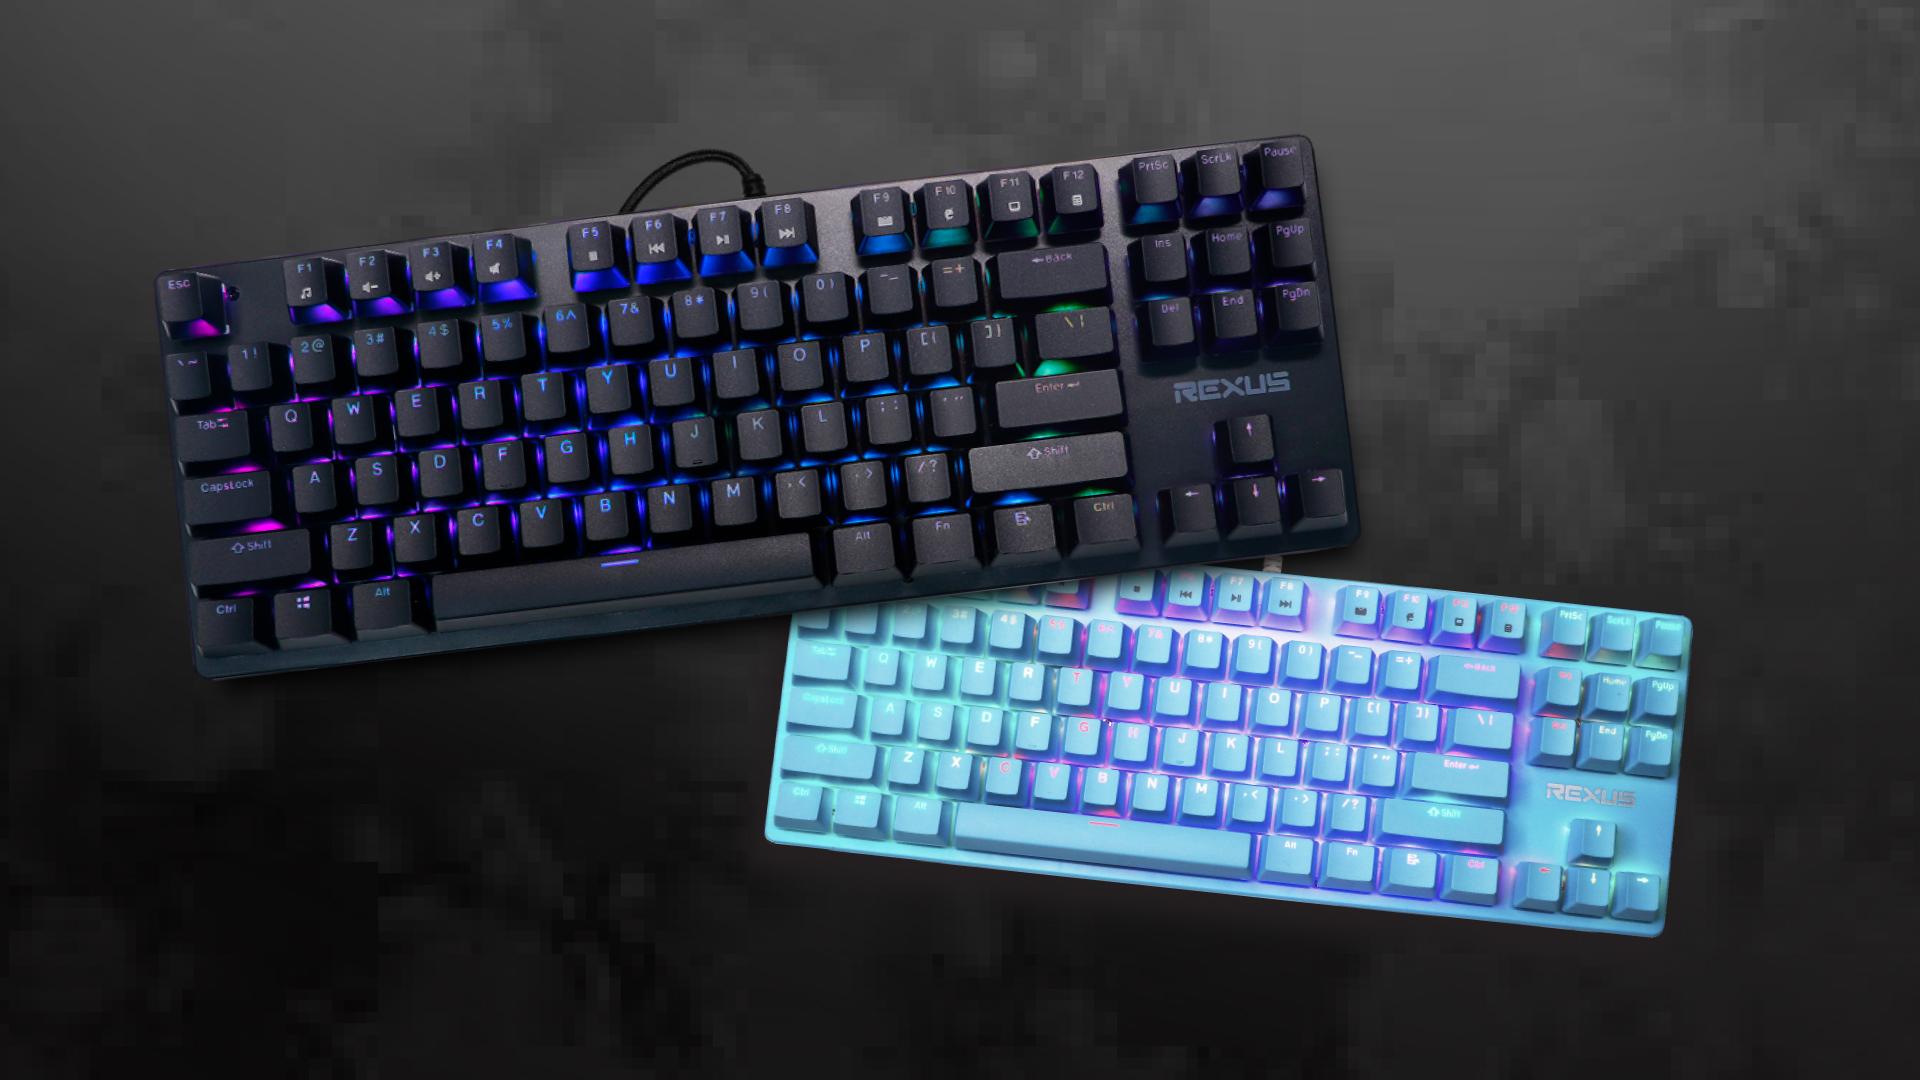 keyboard gaming Rexus Legionare MX9 WL MX9 01